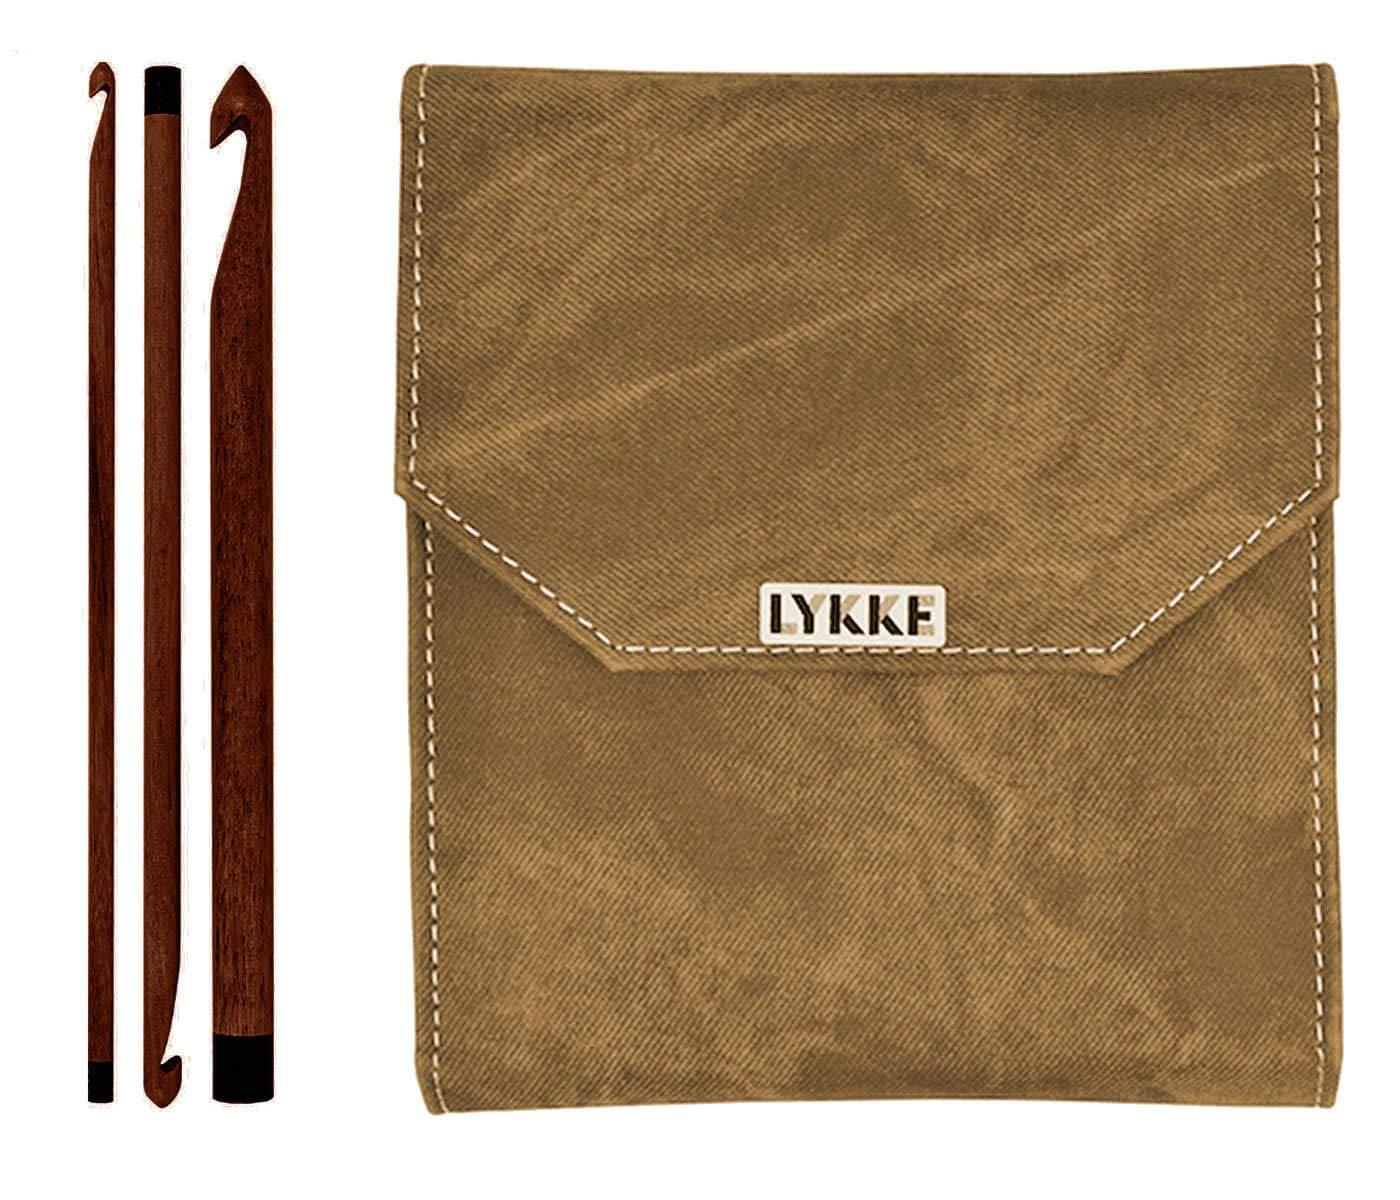 Lykke Driftwood 6 inch Crochet Hook Set (Umber Case) by Lykke (Image #1)